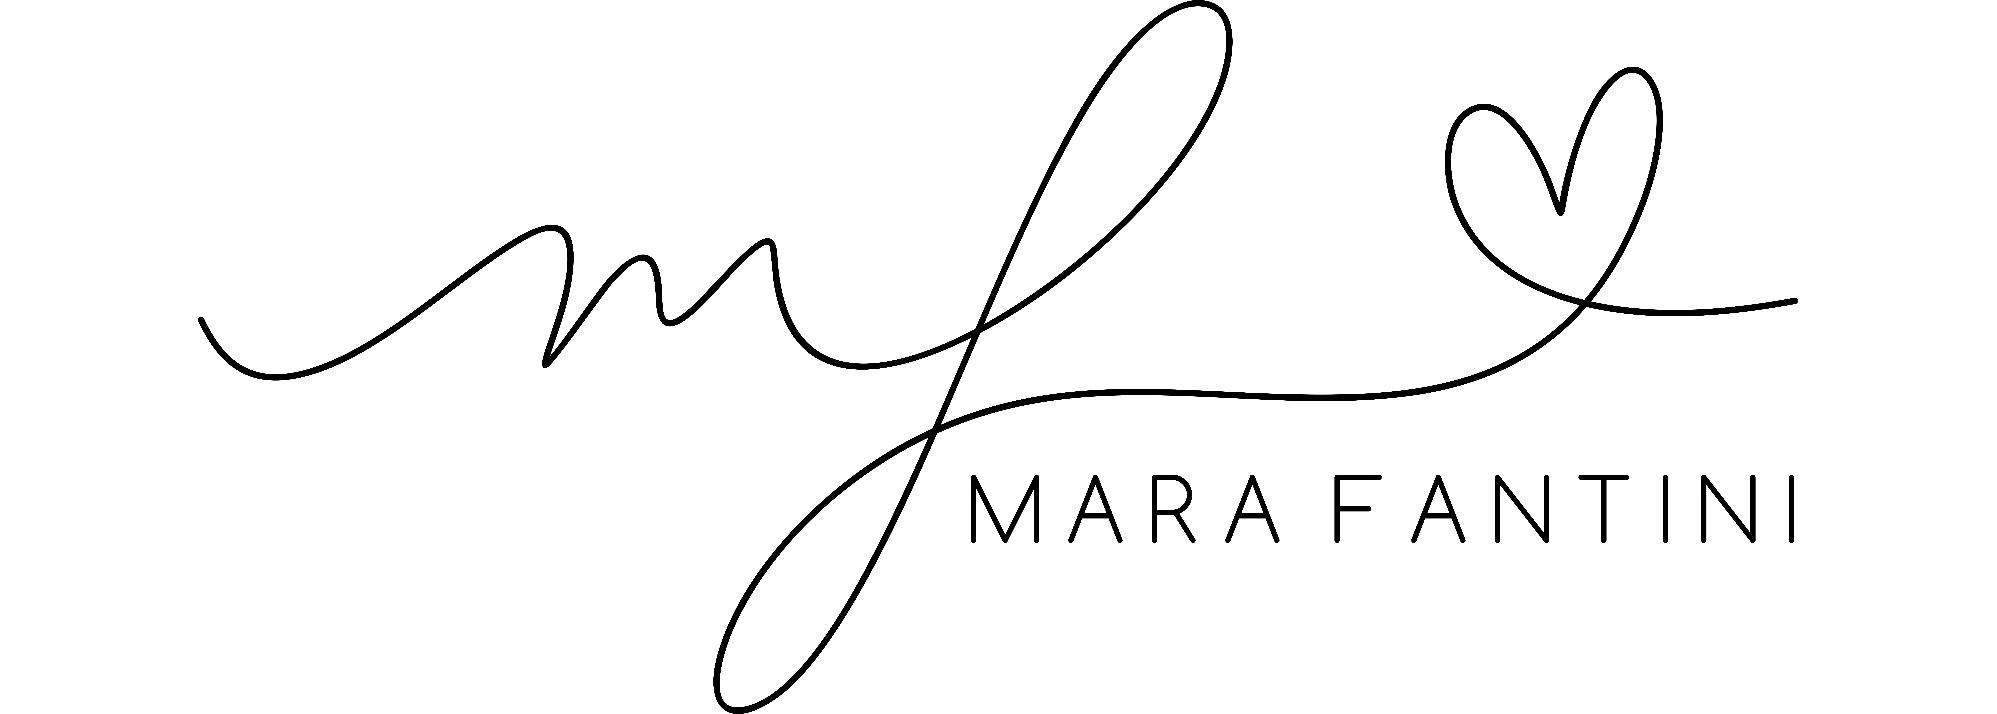 Mara Fantini